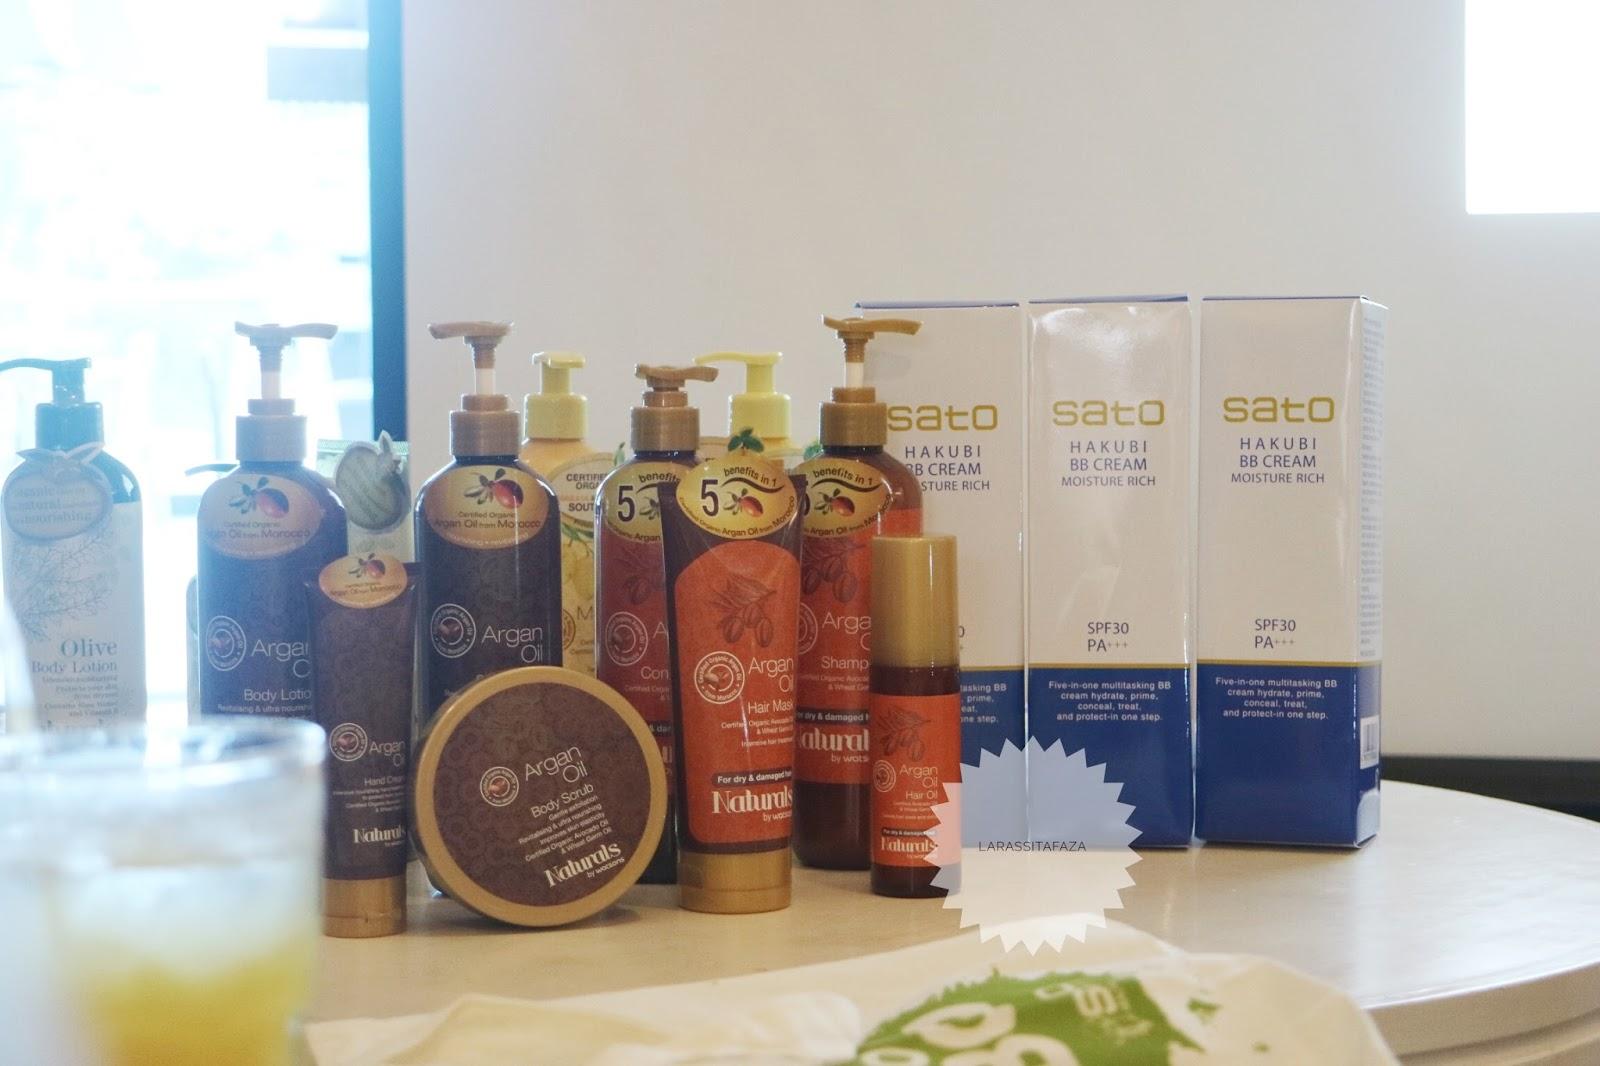 Bb Cream Dari Jepang Hakubi Blogger Gathering With Watsons Laras Sato Pastaron Produk Di Atas Adalah Terbaru Indonesia Yaitu Naturals By Sesuai Dengan Namanya Baru Mereka Berbahan Dasar